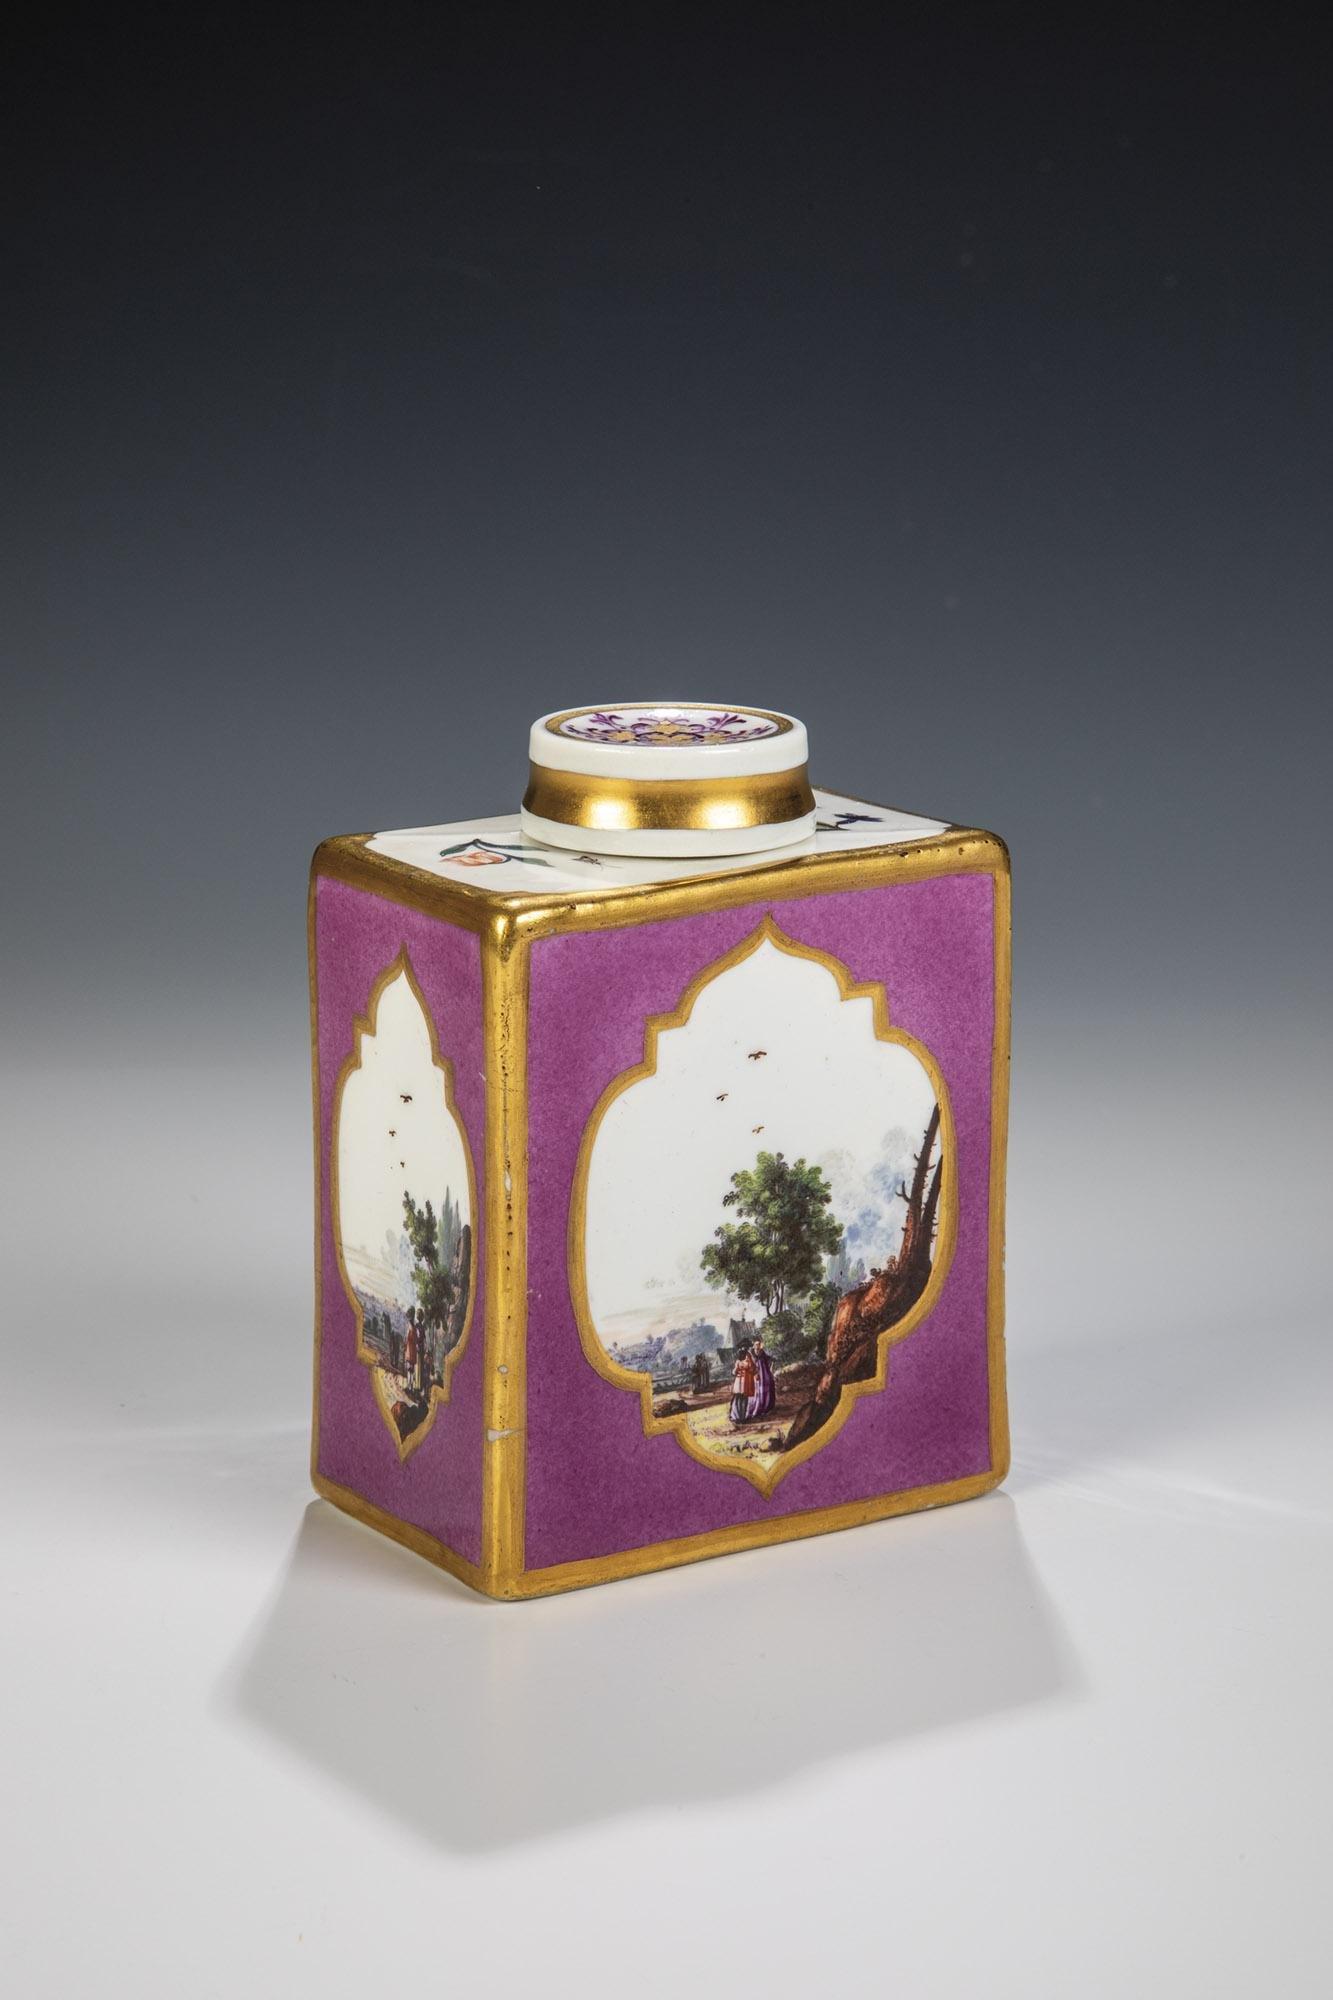 Grosse Teedose mit Kauffahrteiszenen